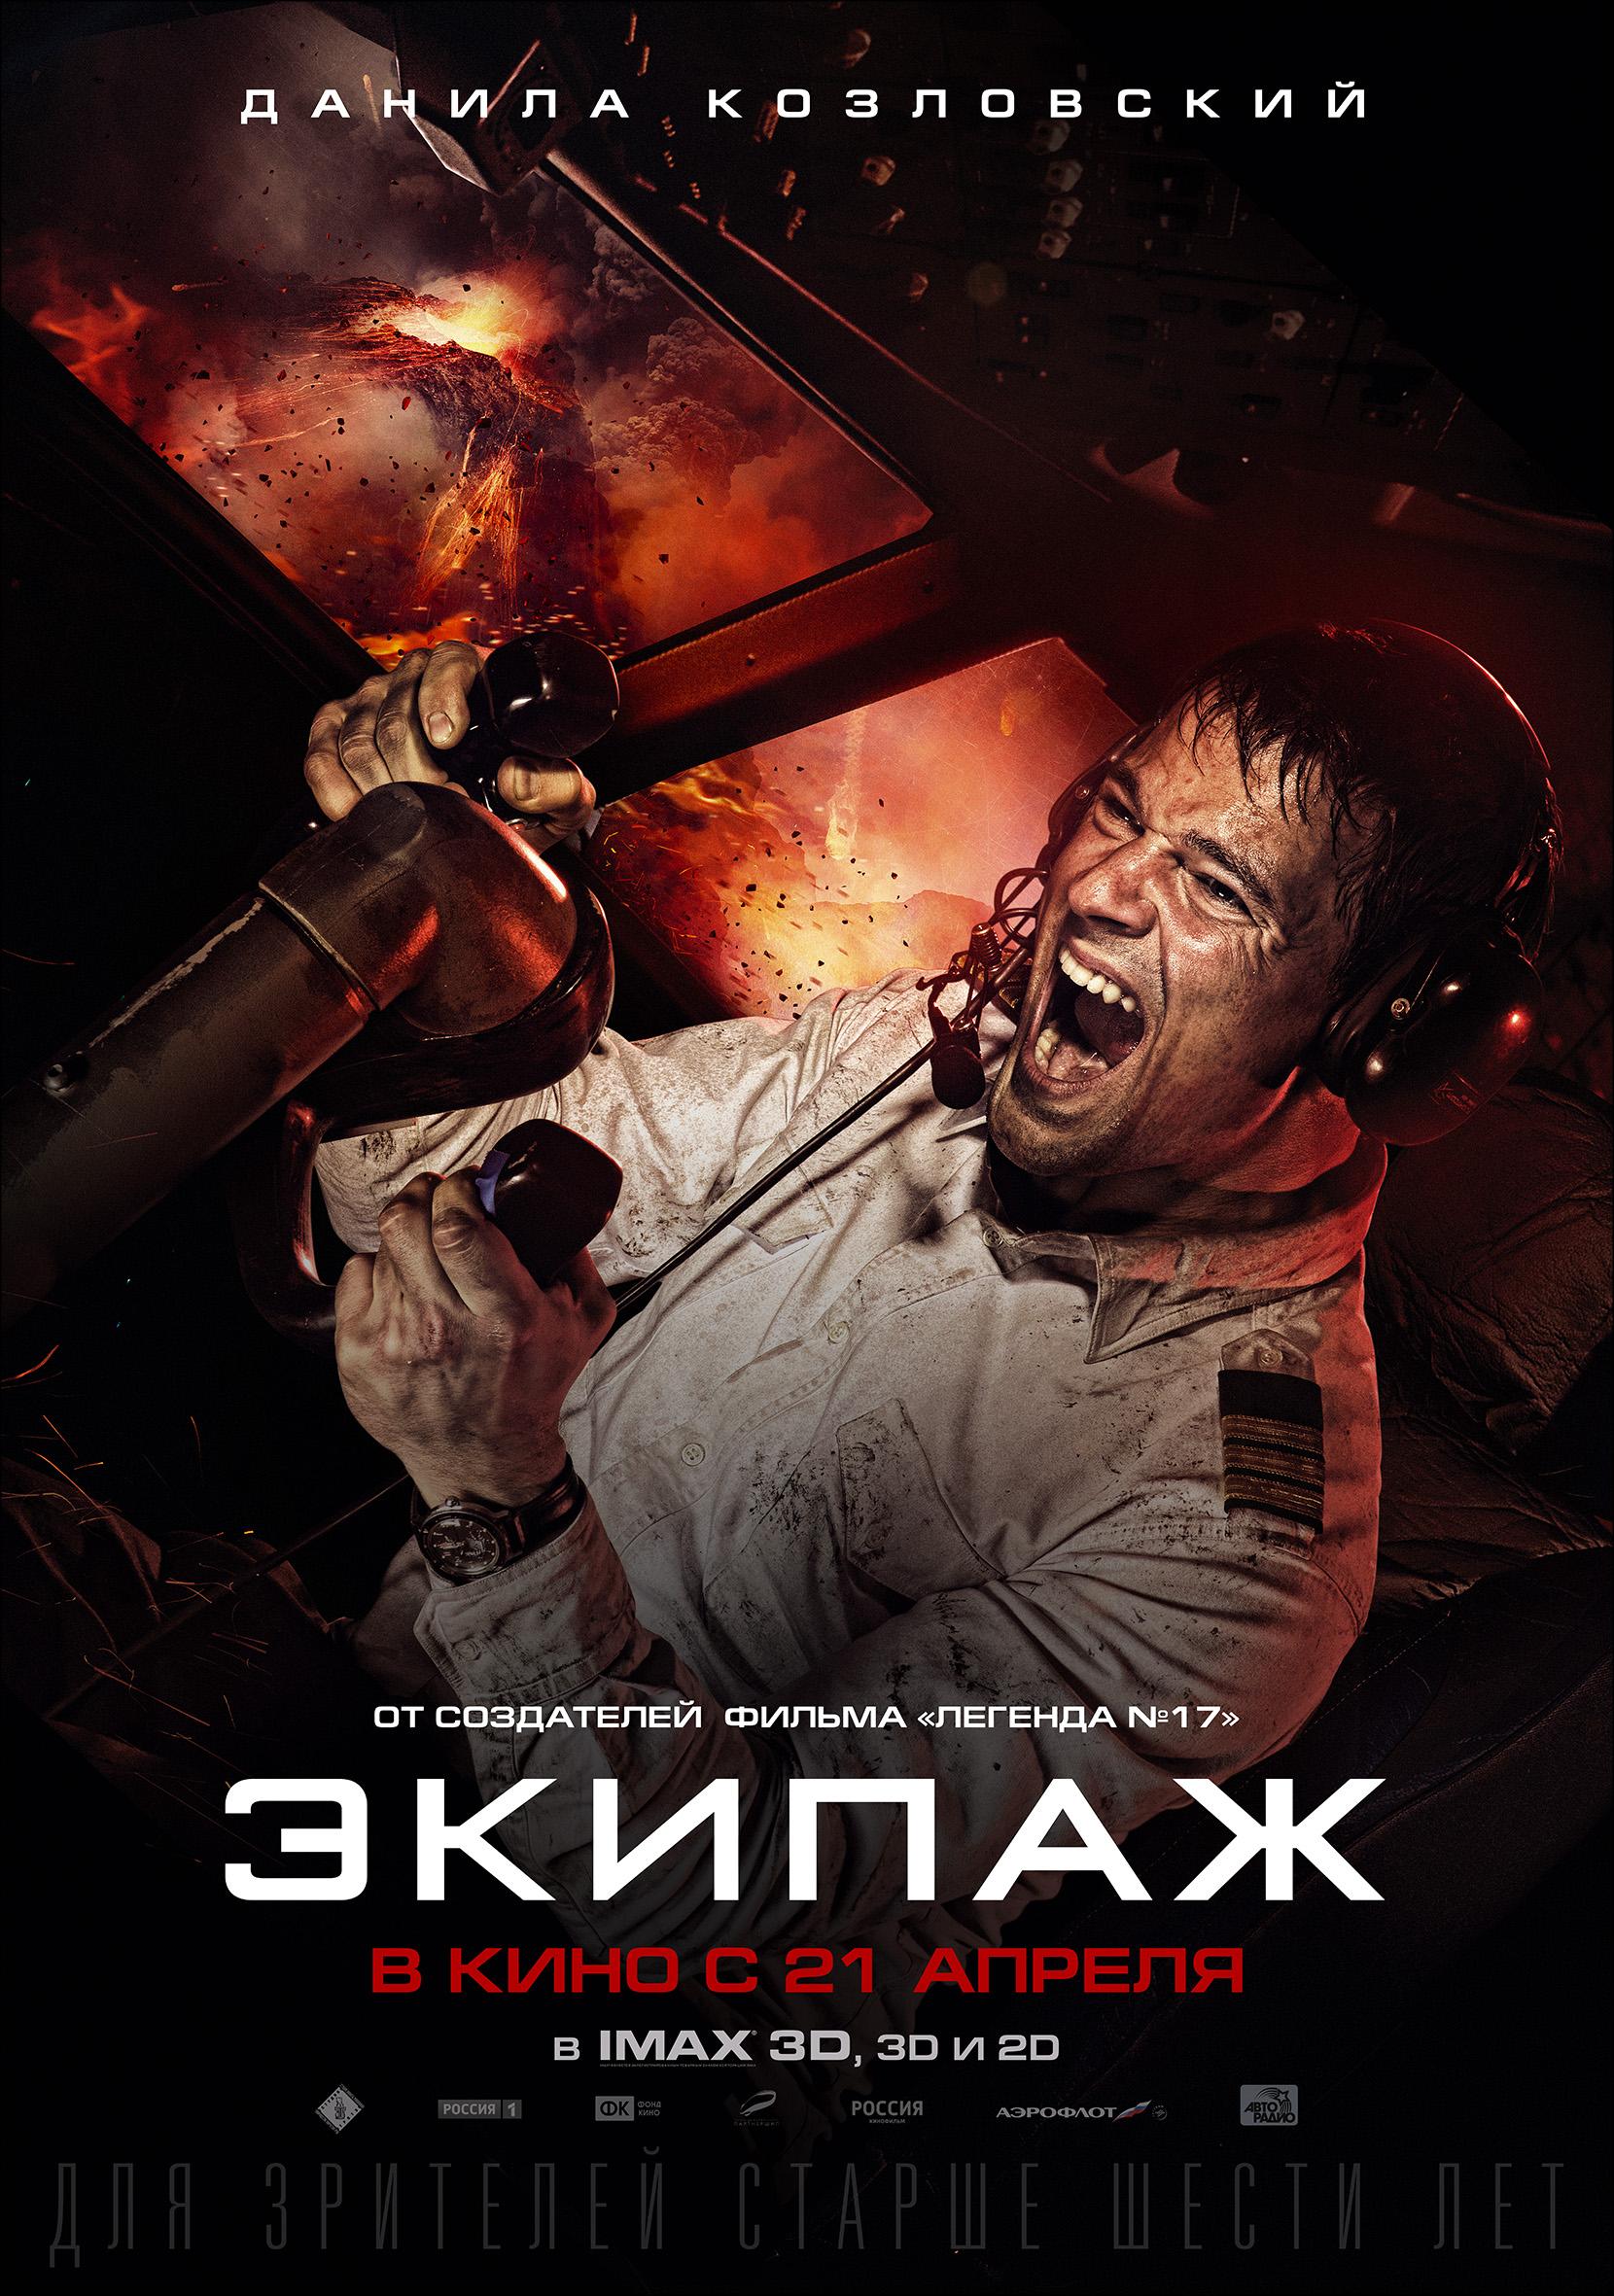 Экипаж (фильм, 2016)